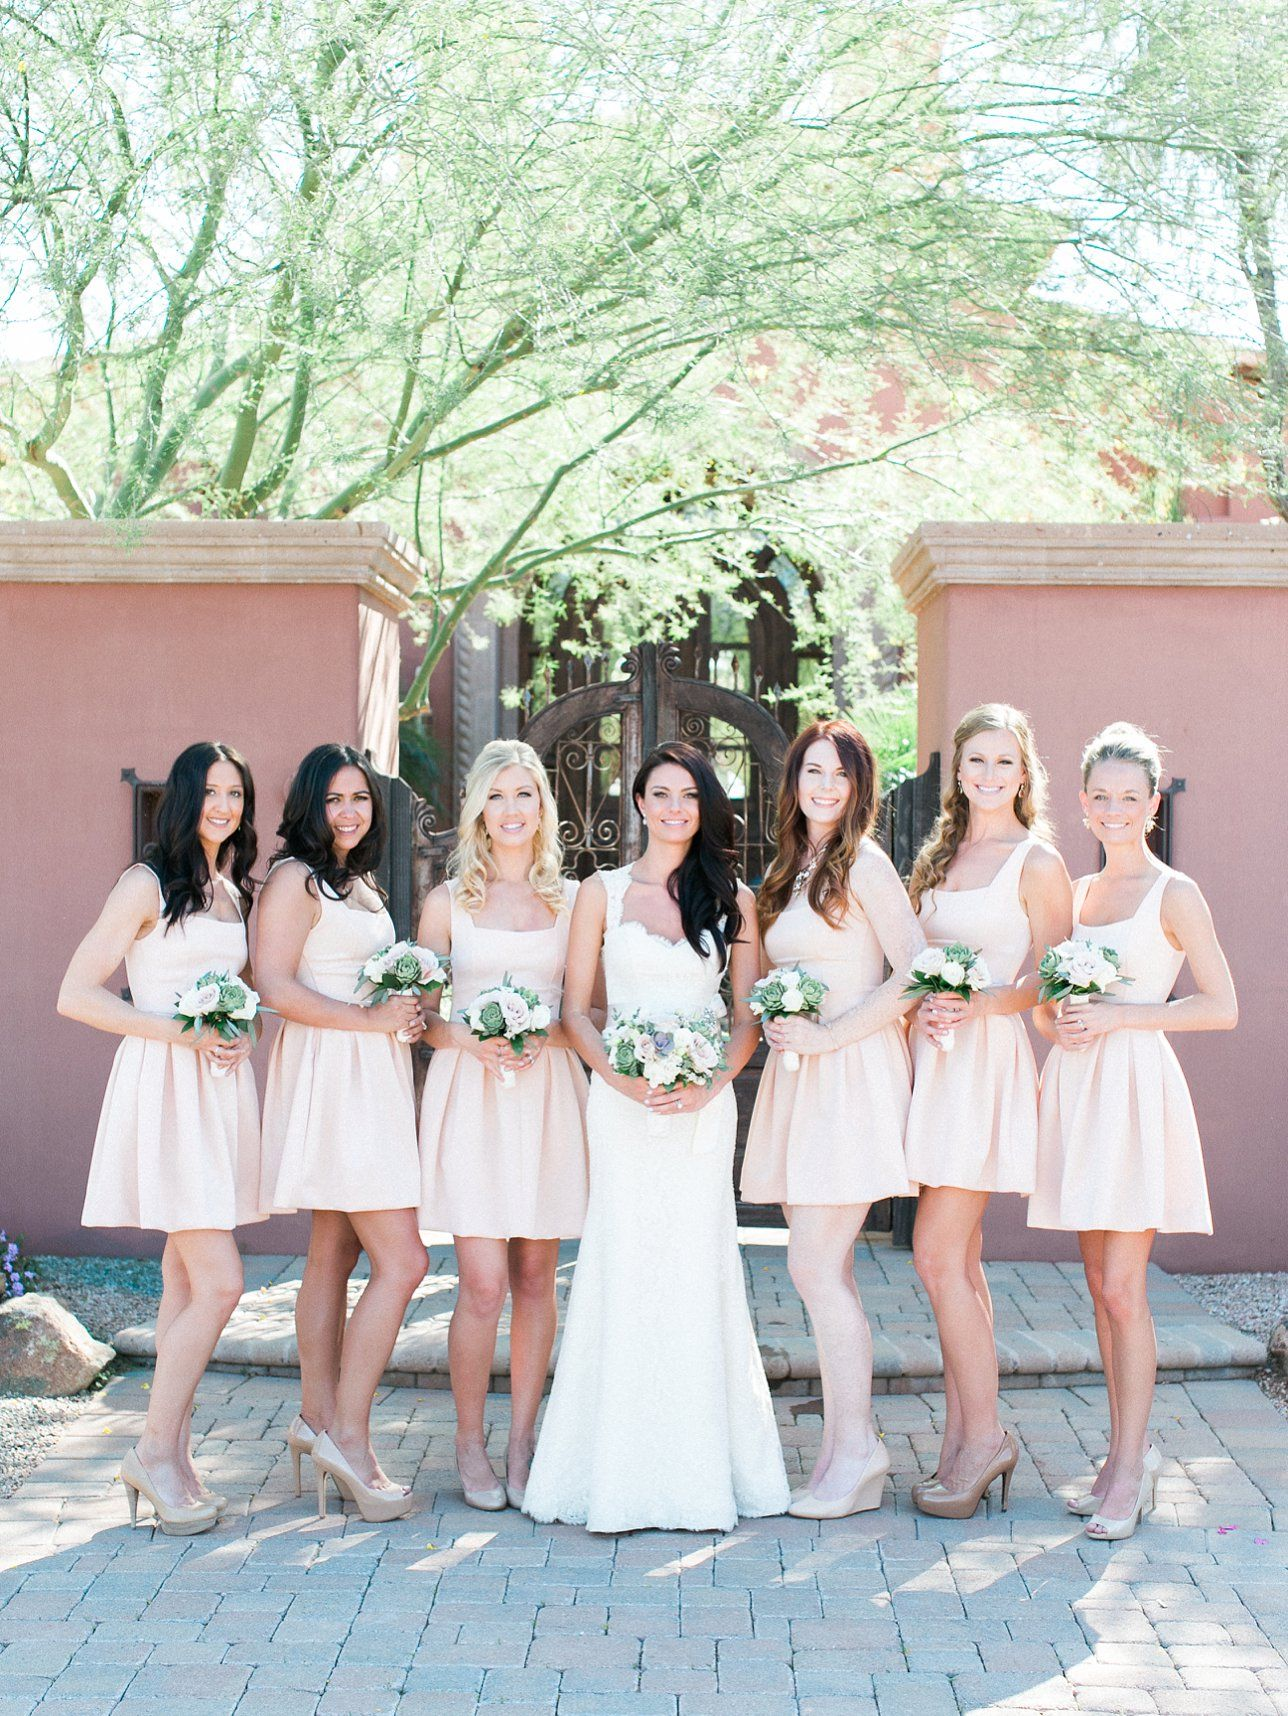 Blush bridesmaid dresses short bridesmaid dresses nude heels blush bridesmaid dresses short bridesmaid dresses nude heels bridesmaid shoes http ombrellifo Gallery